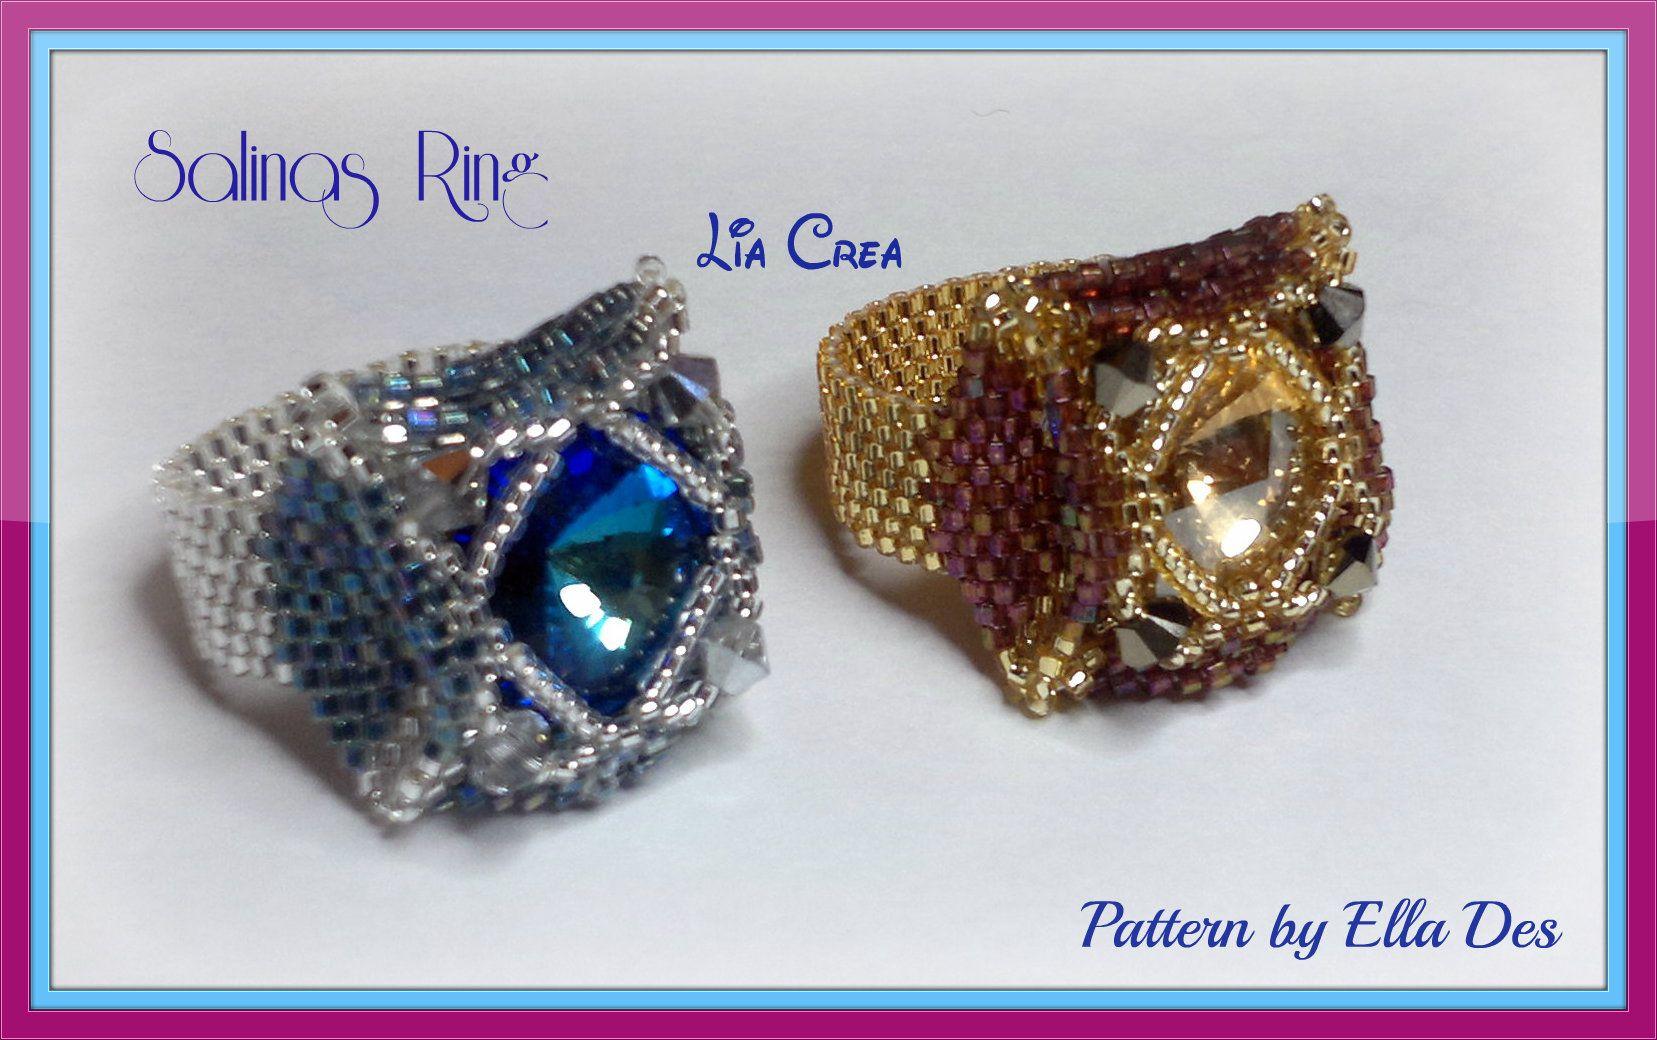 Salinas Ring - pattern by Ella Des